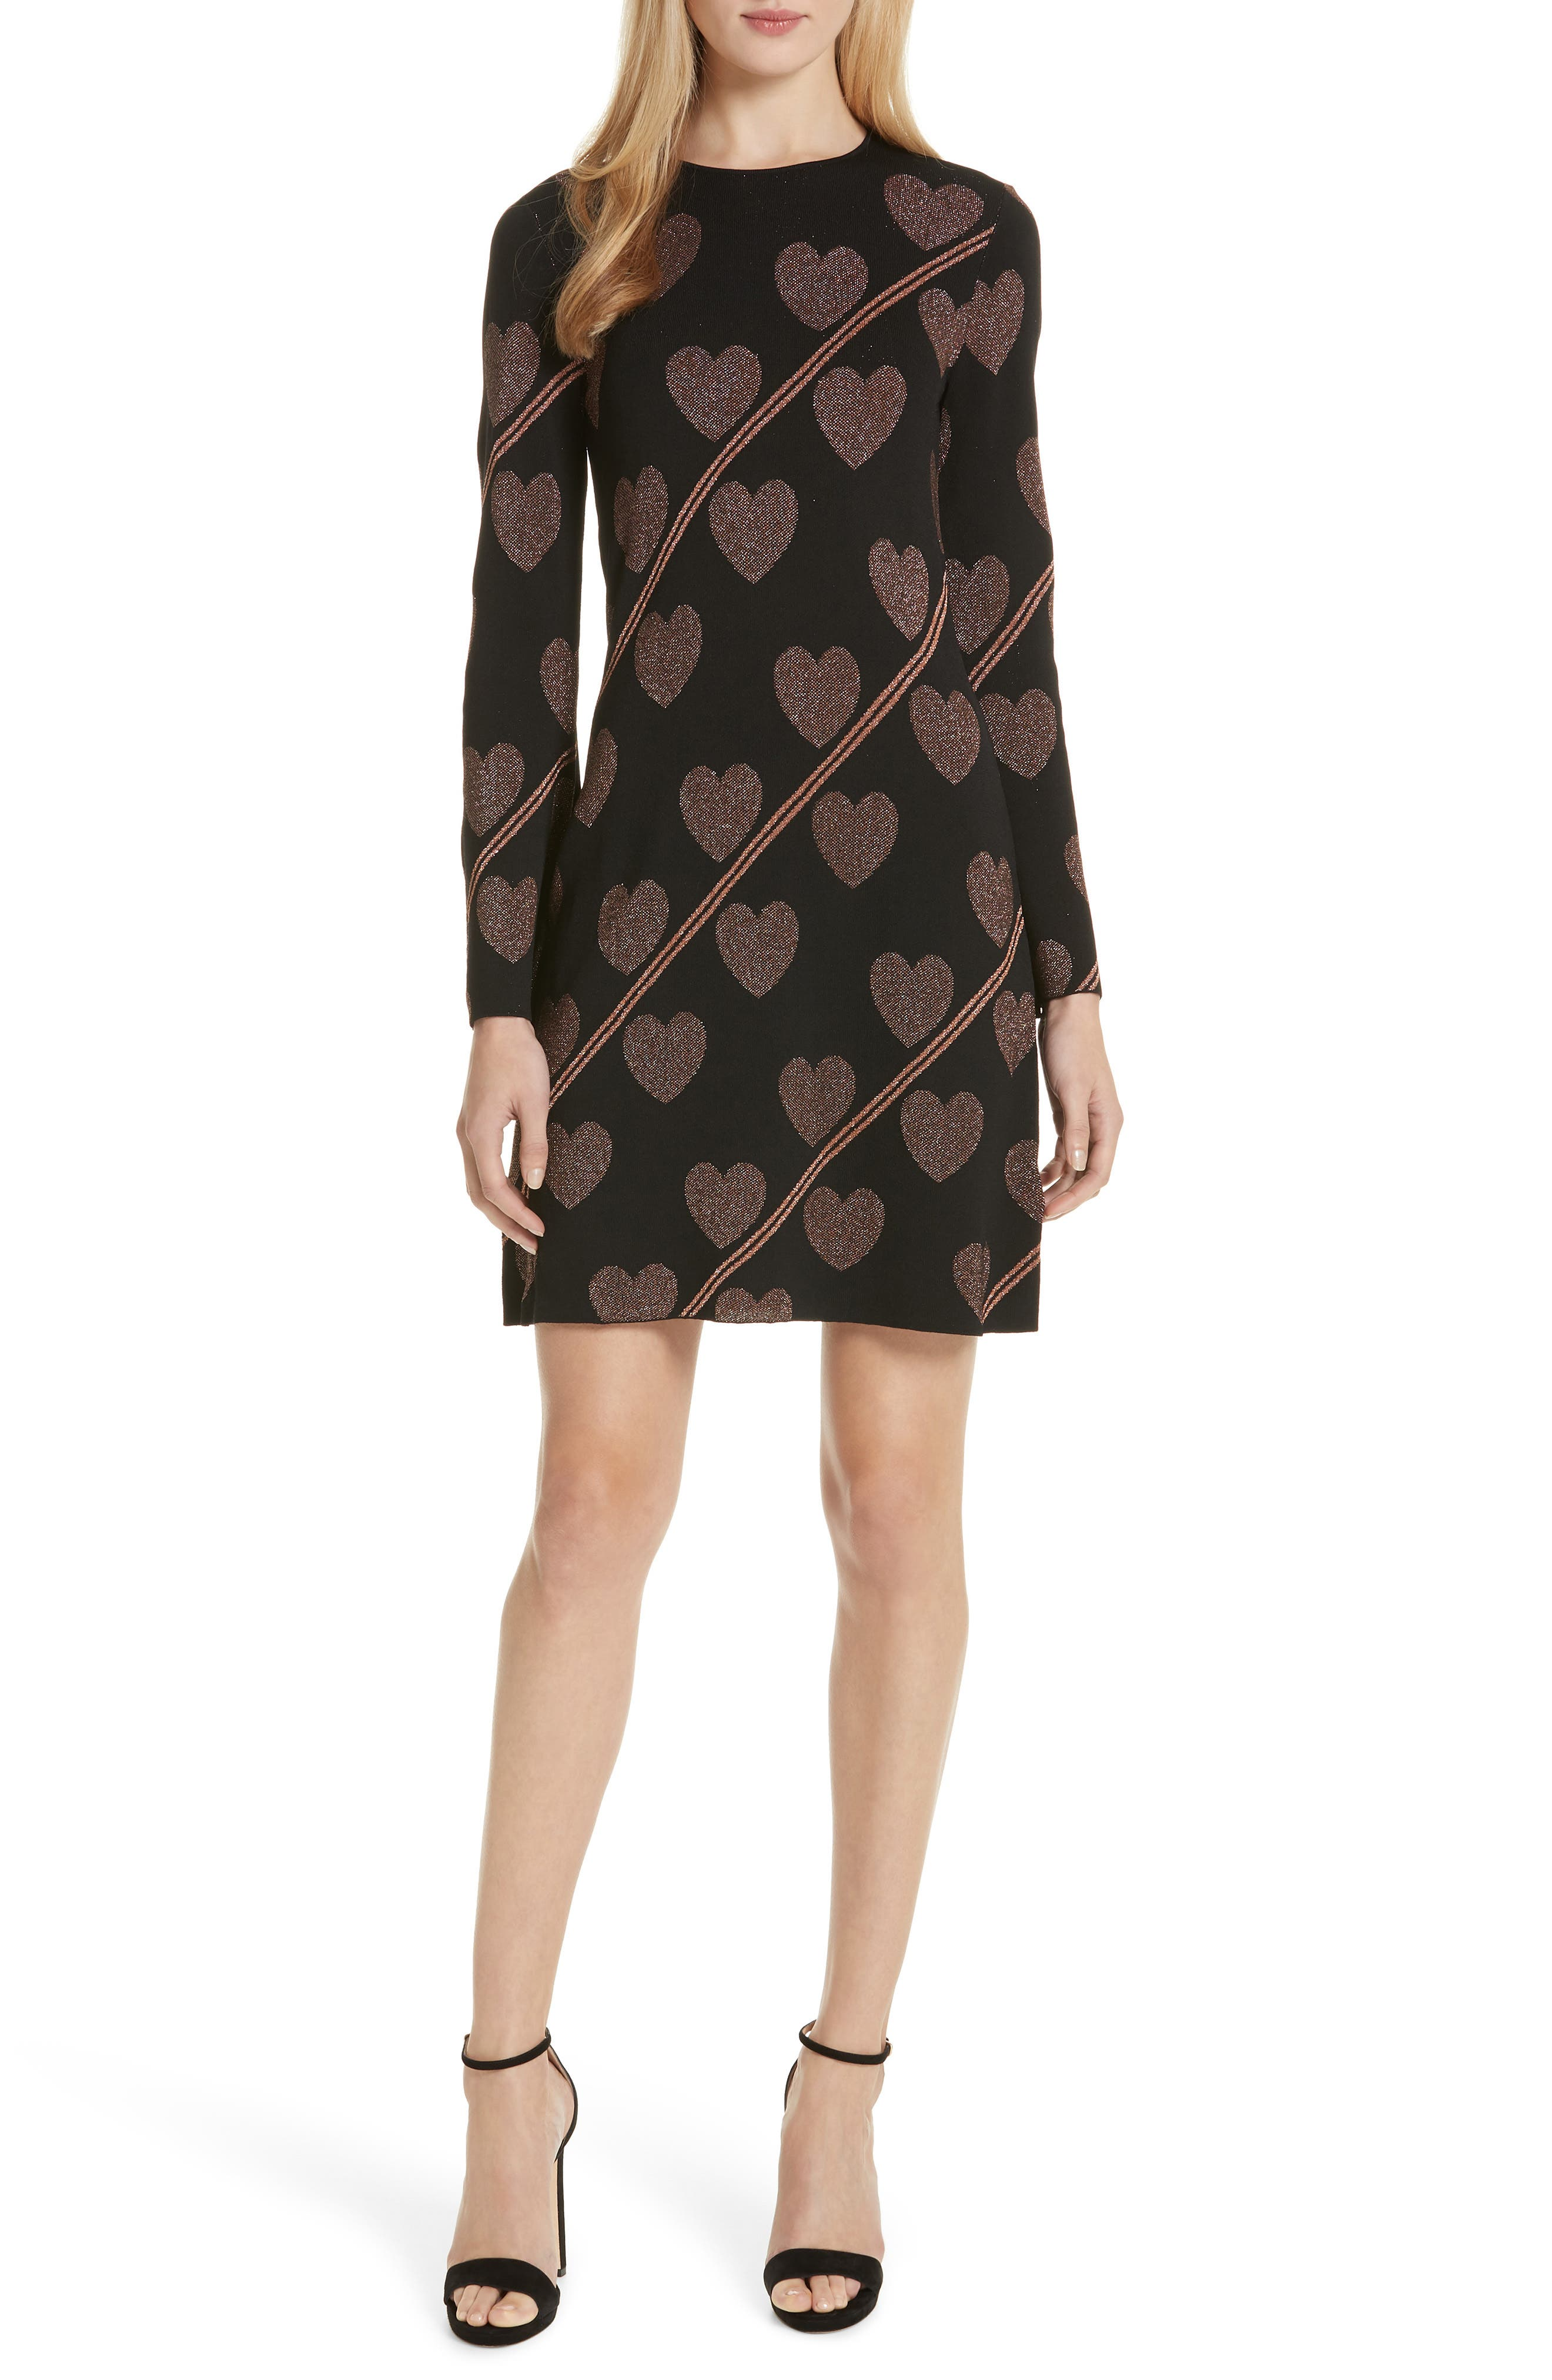 Uzeniaa Joyous Sweater Dress,                             Main thumbnail 1, color,                             BLACK